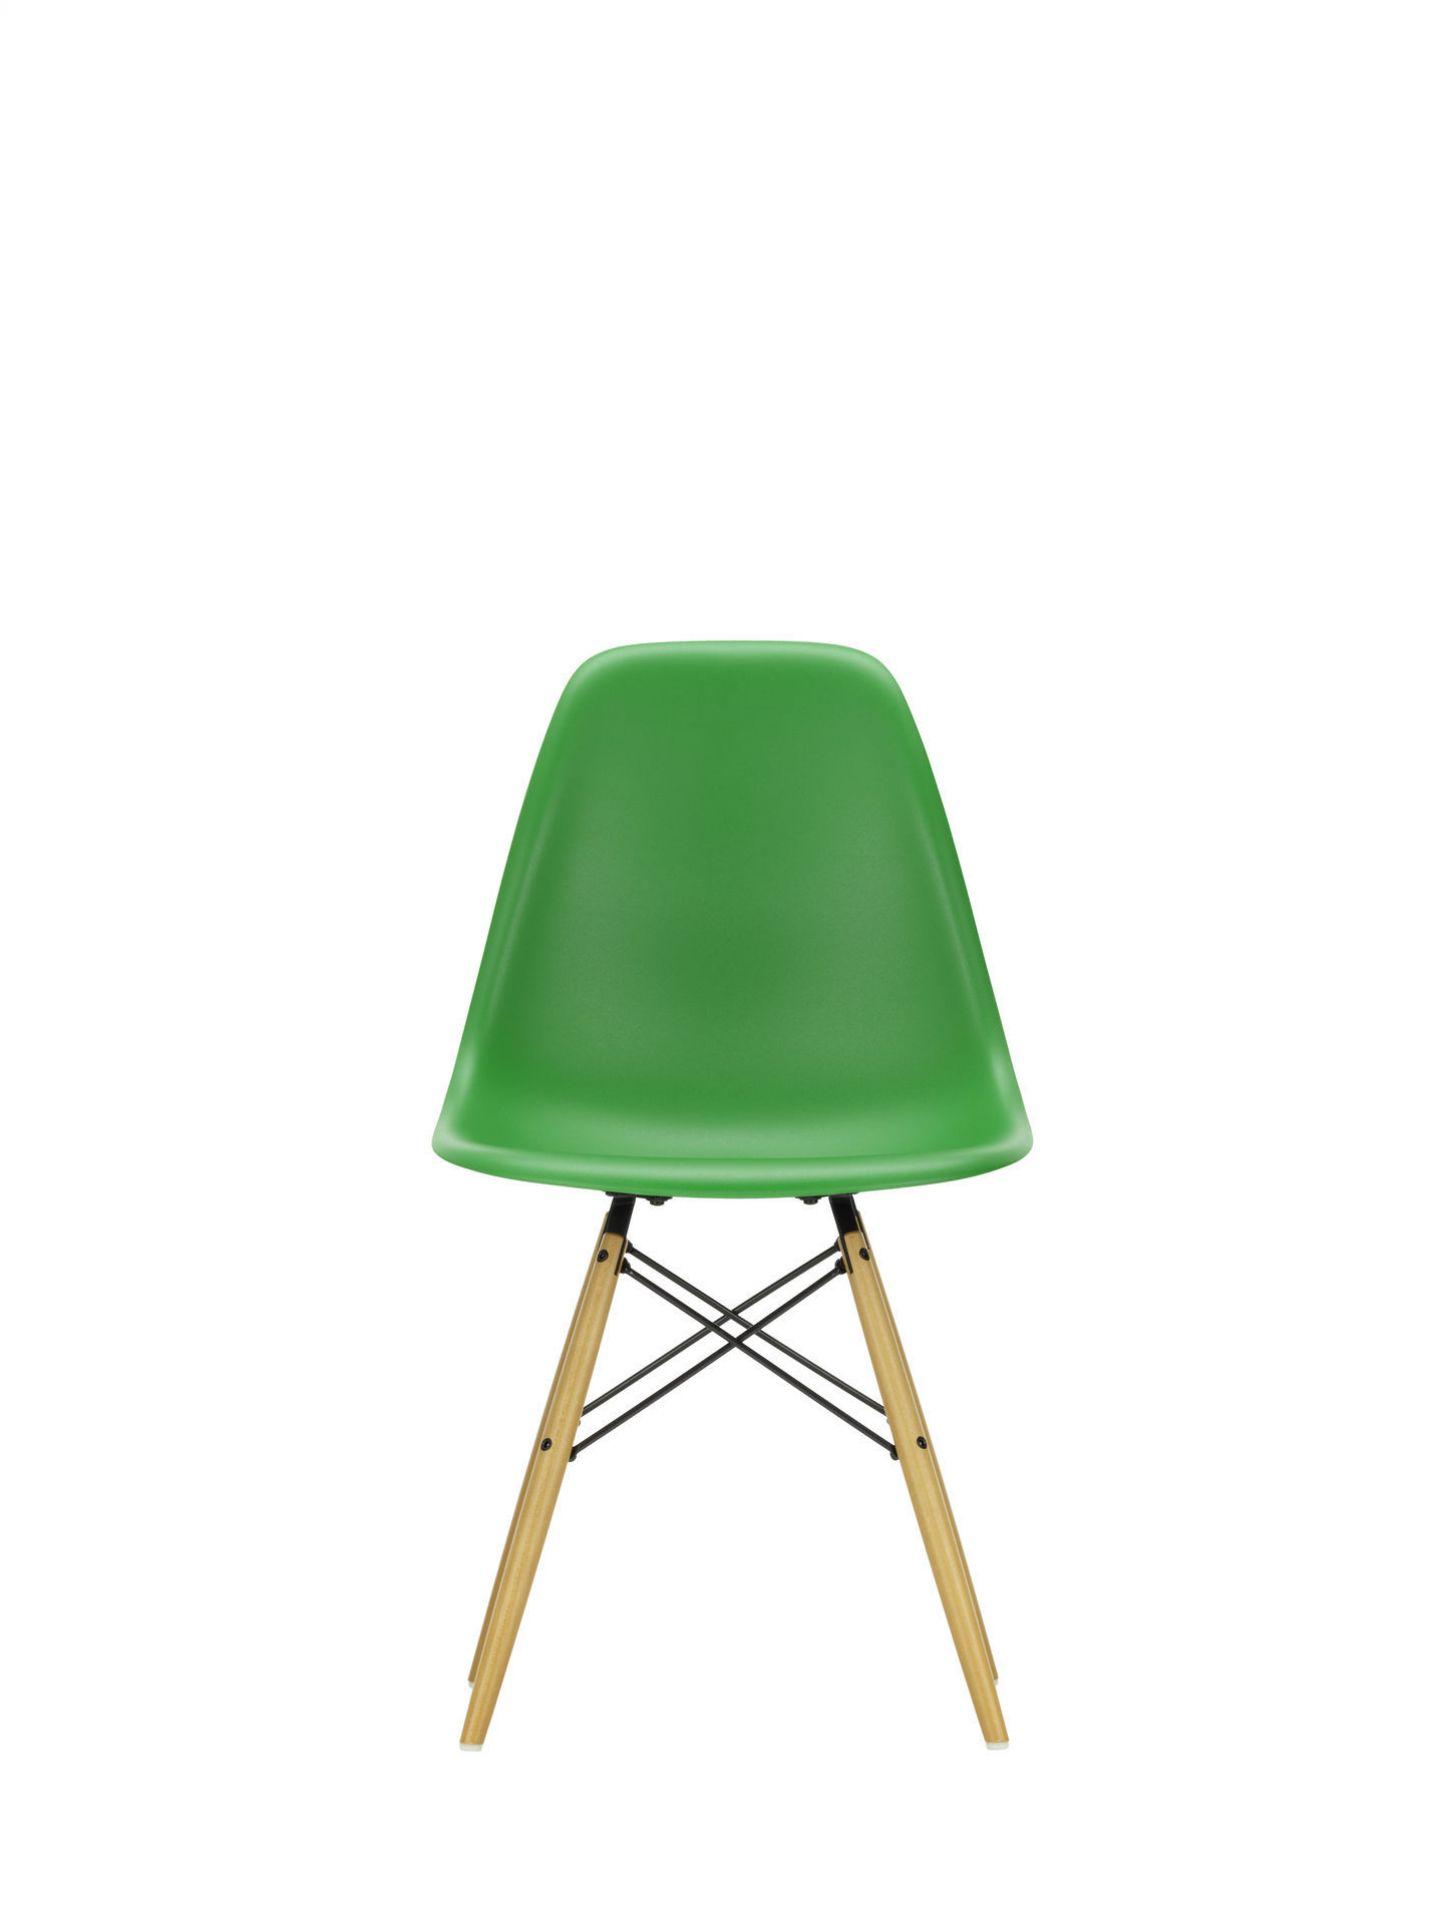 Eames Plastic Side Chair DSW Stuhl Vitra Ahorn gelblich-Zartrosa